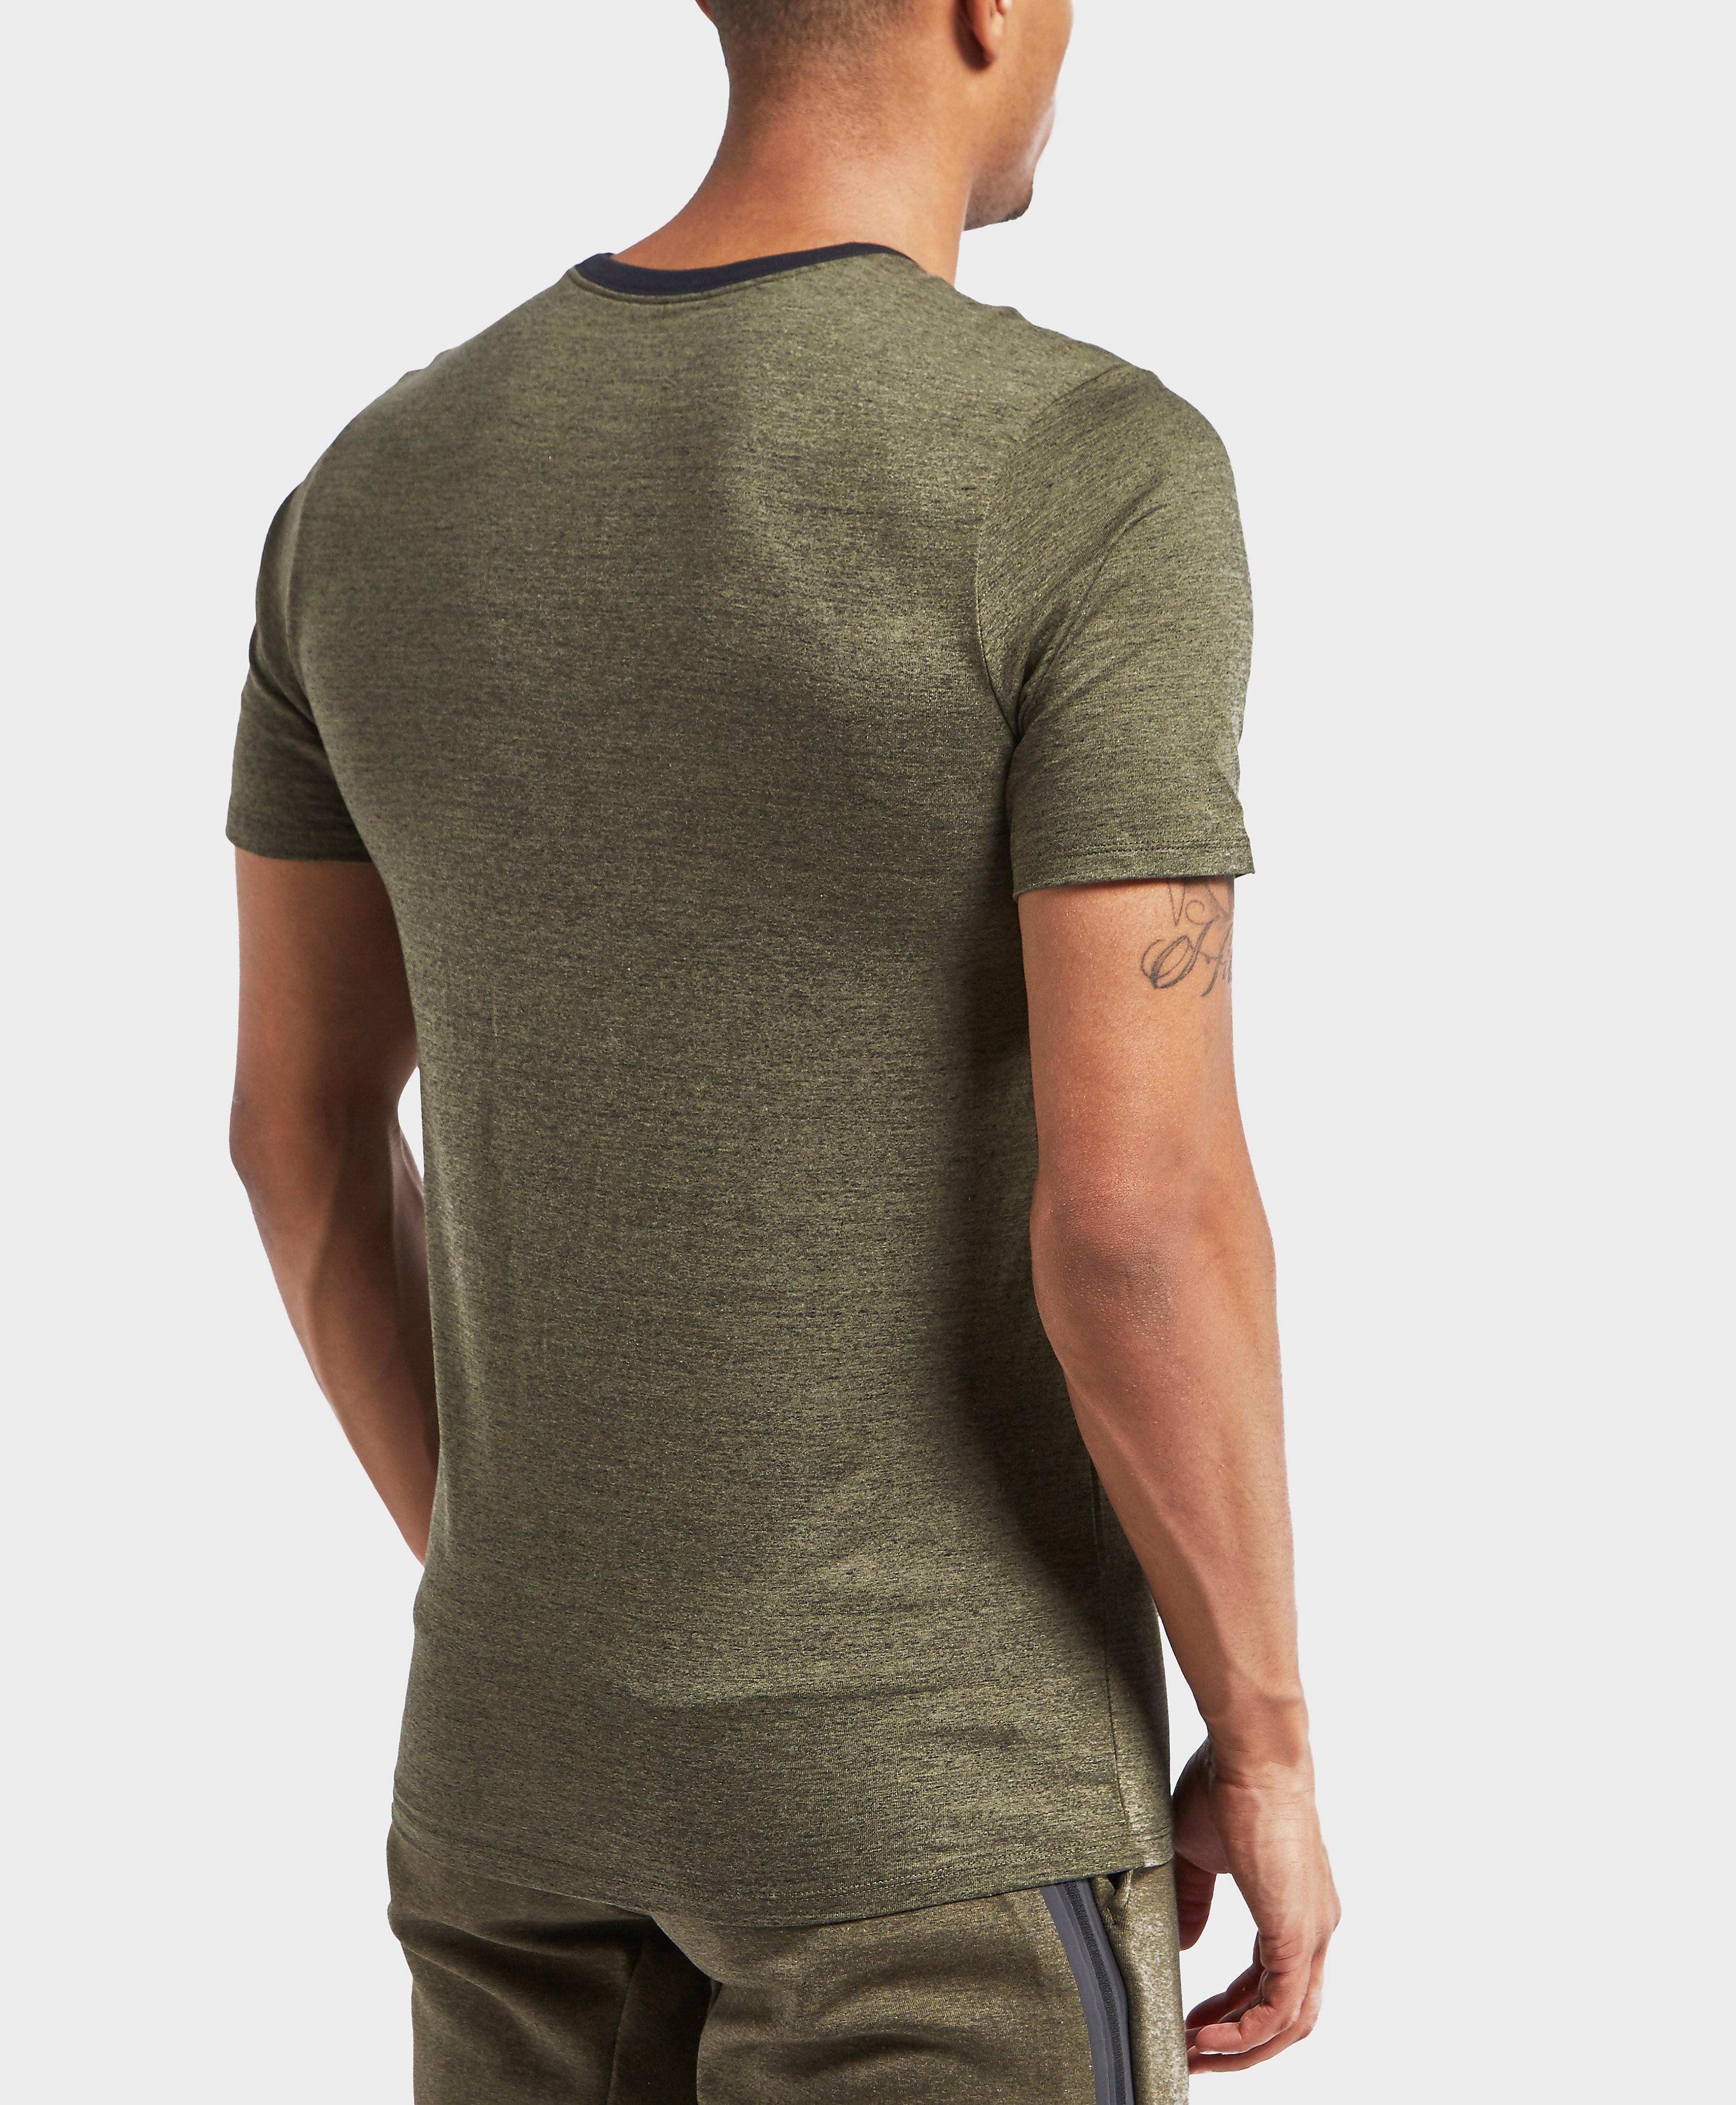 Nike Modern Ring Short Sleeve T-Shirt